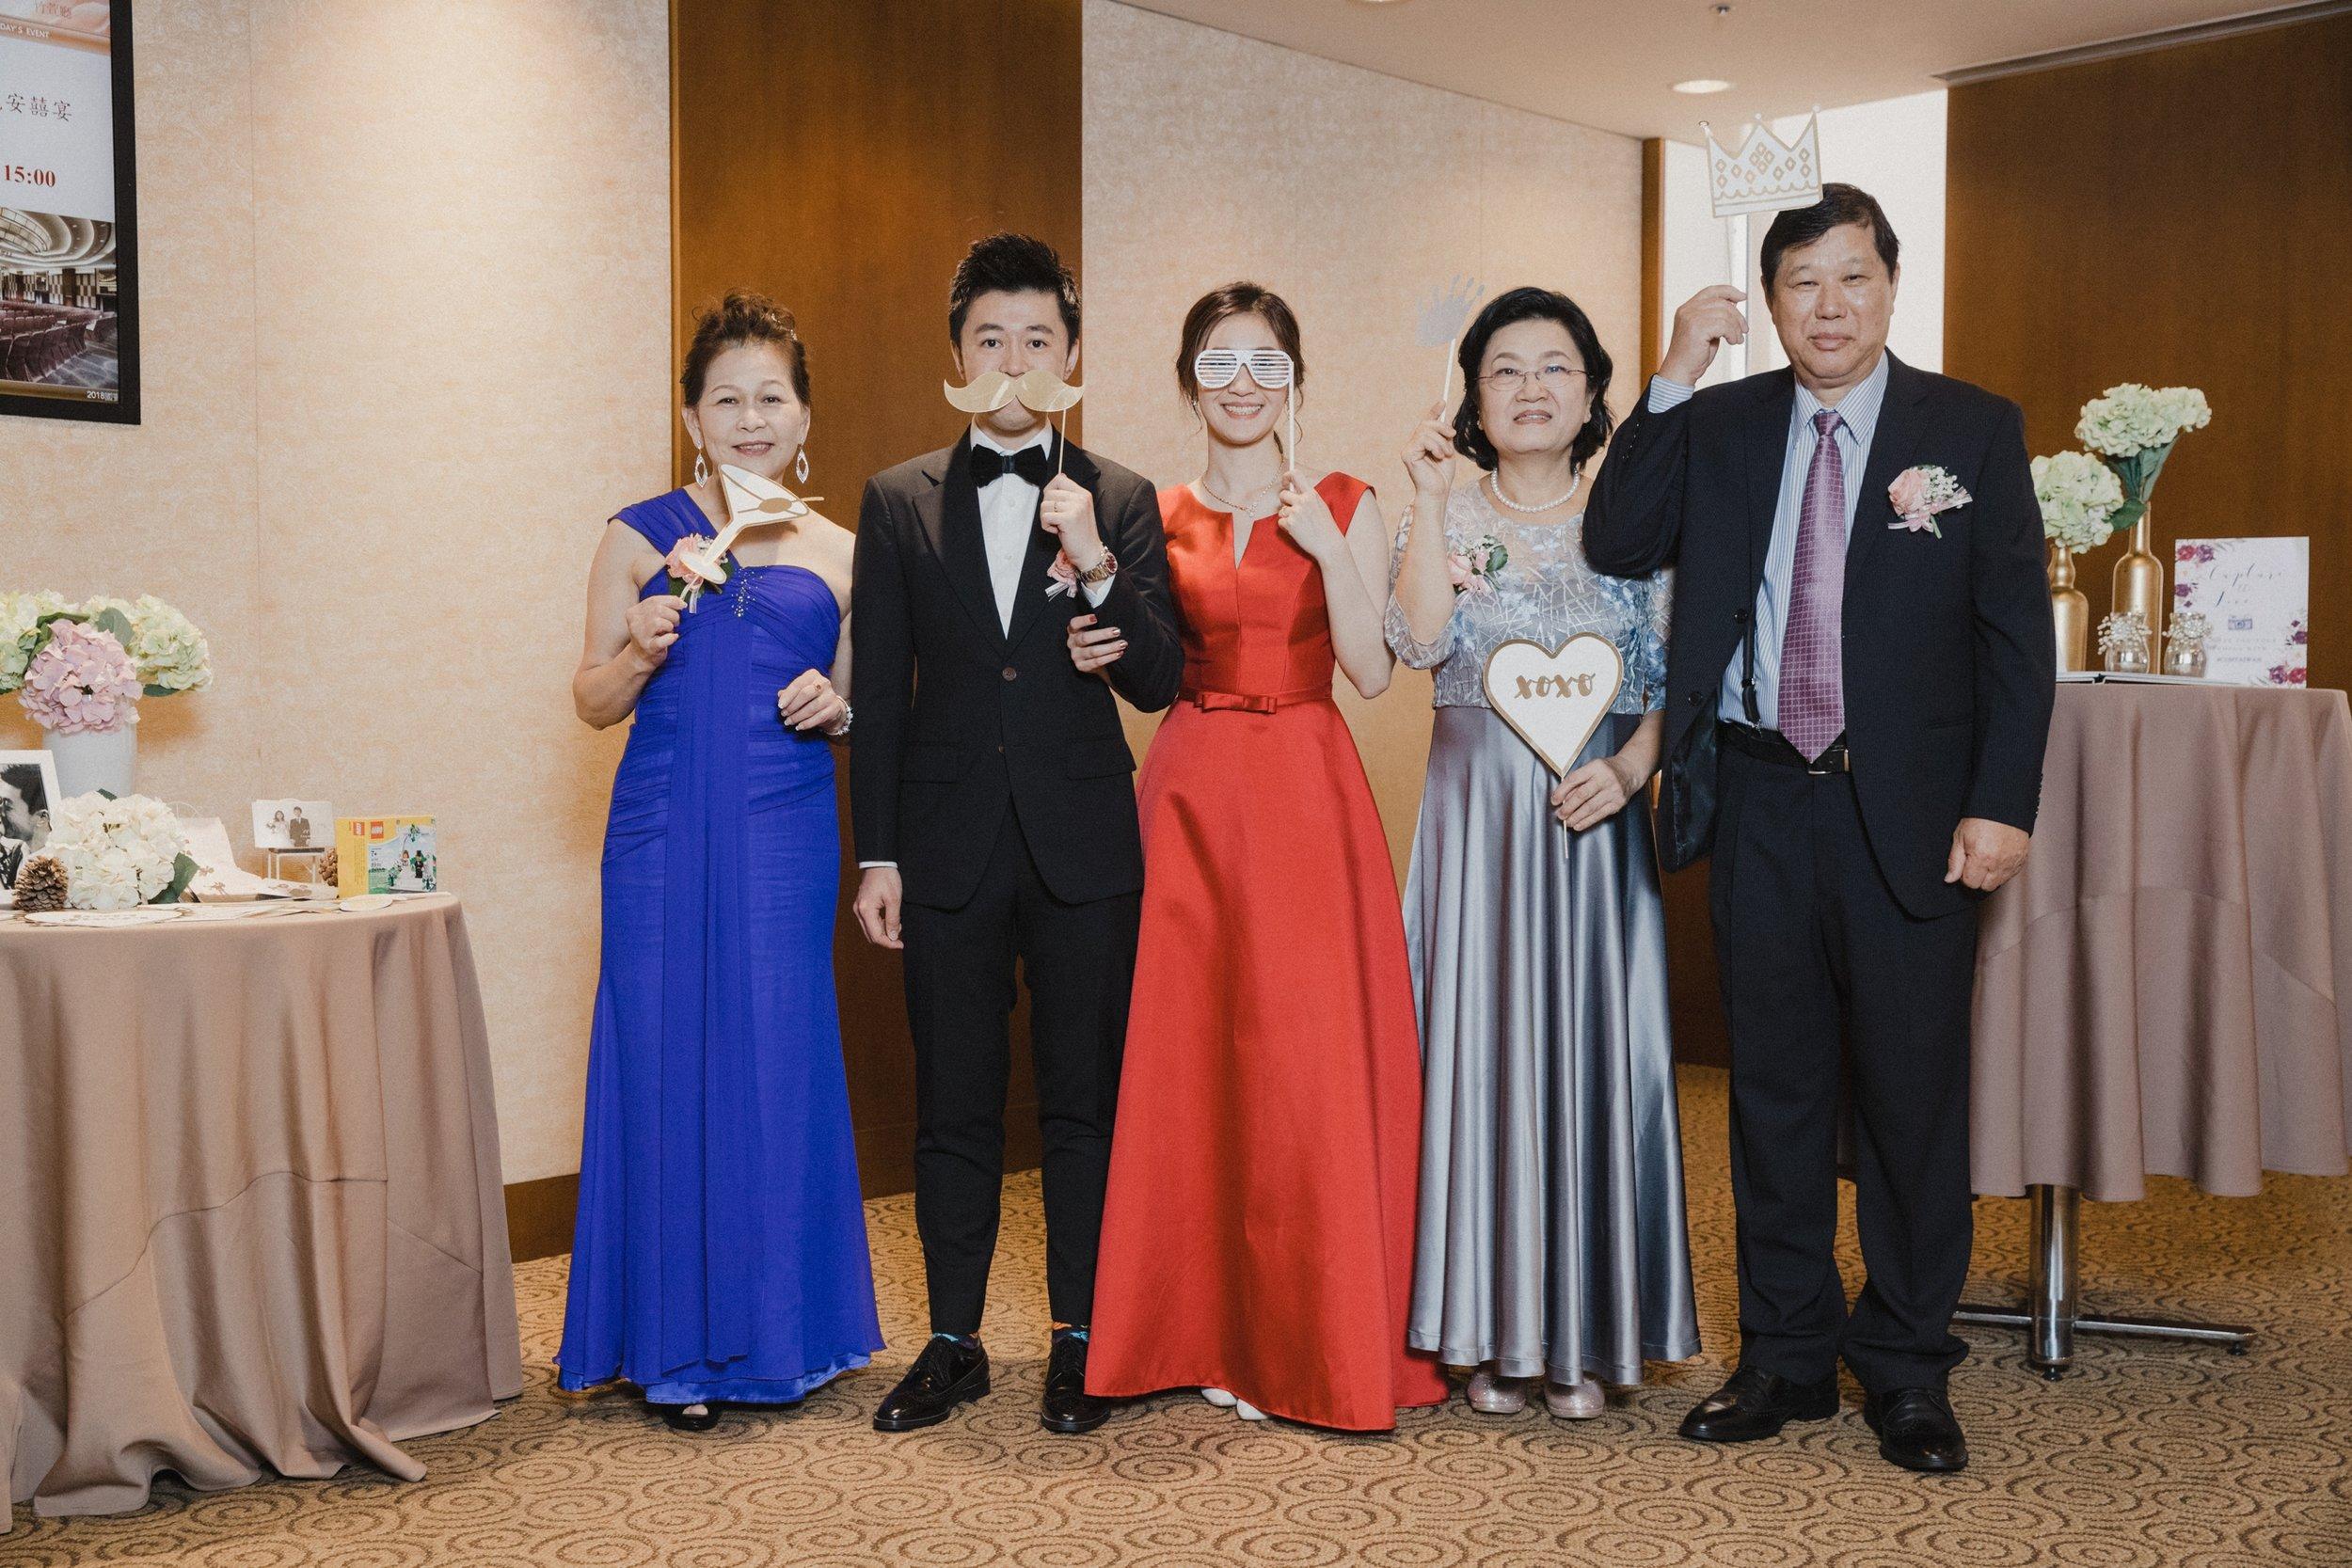 wedding-caridee-oscar-lunch-ambassador-hsinchu-結婚午宴-新竹國賓_160.jpg